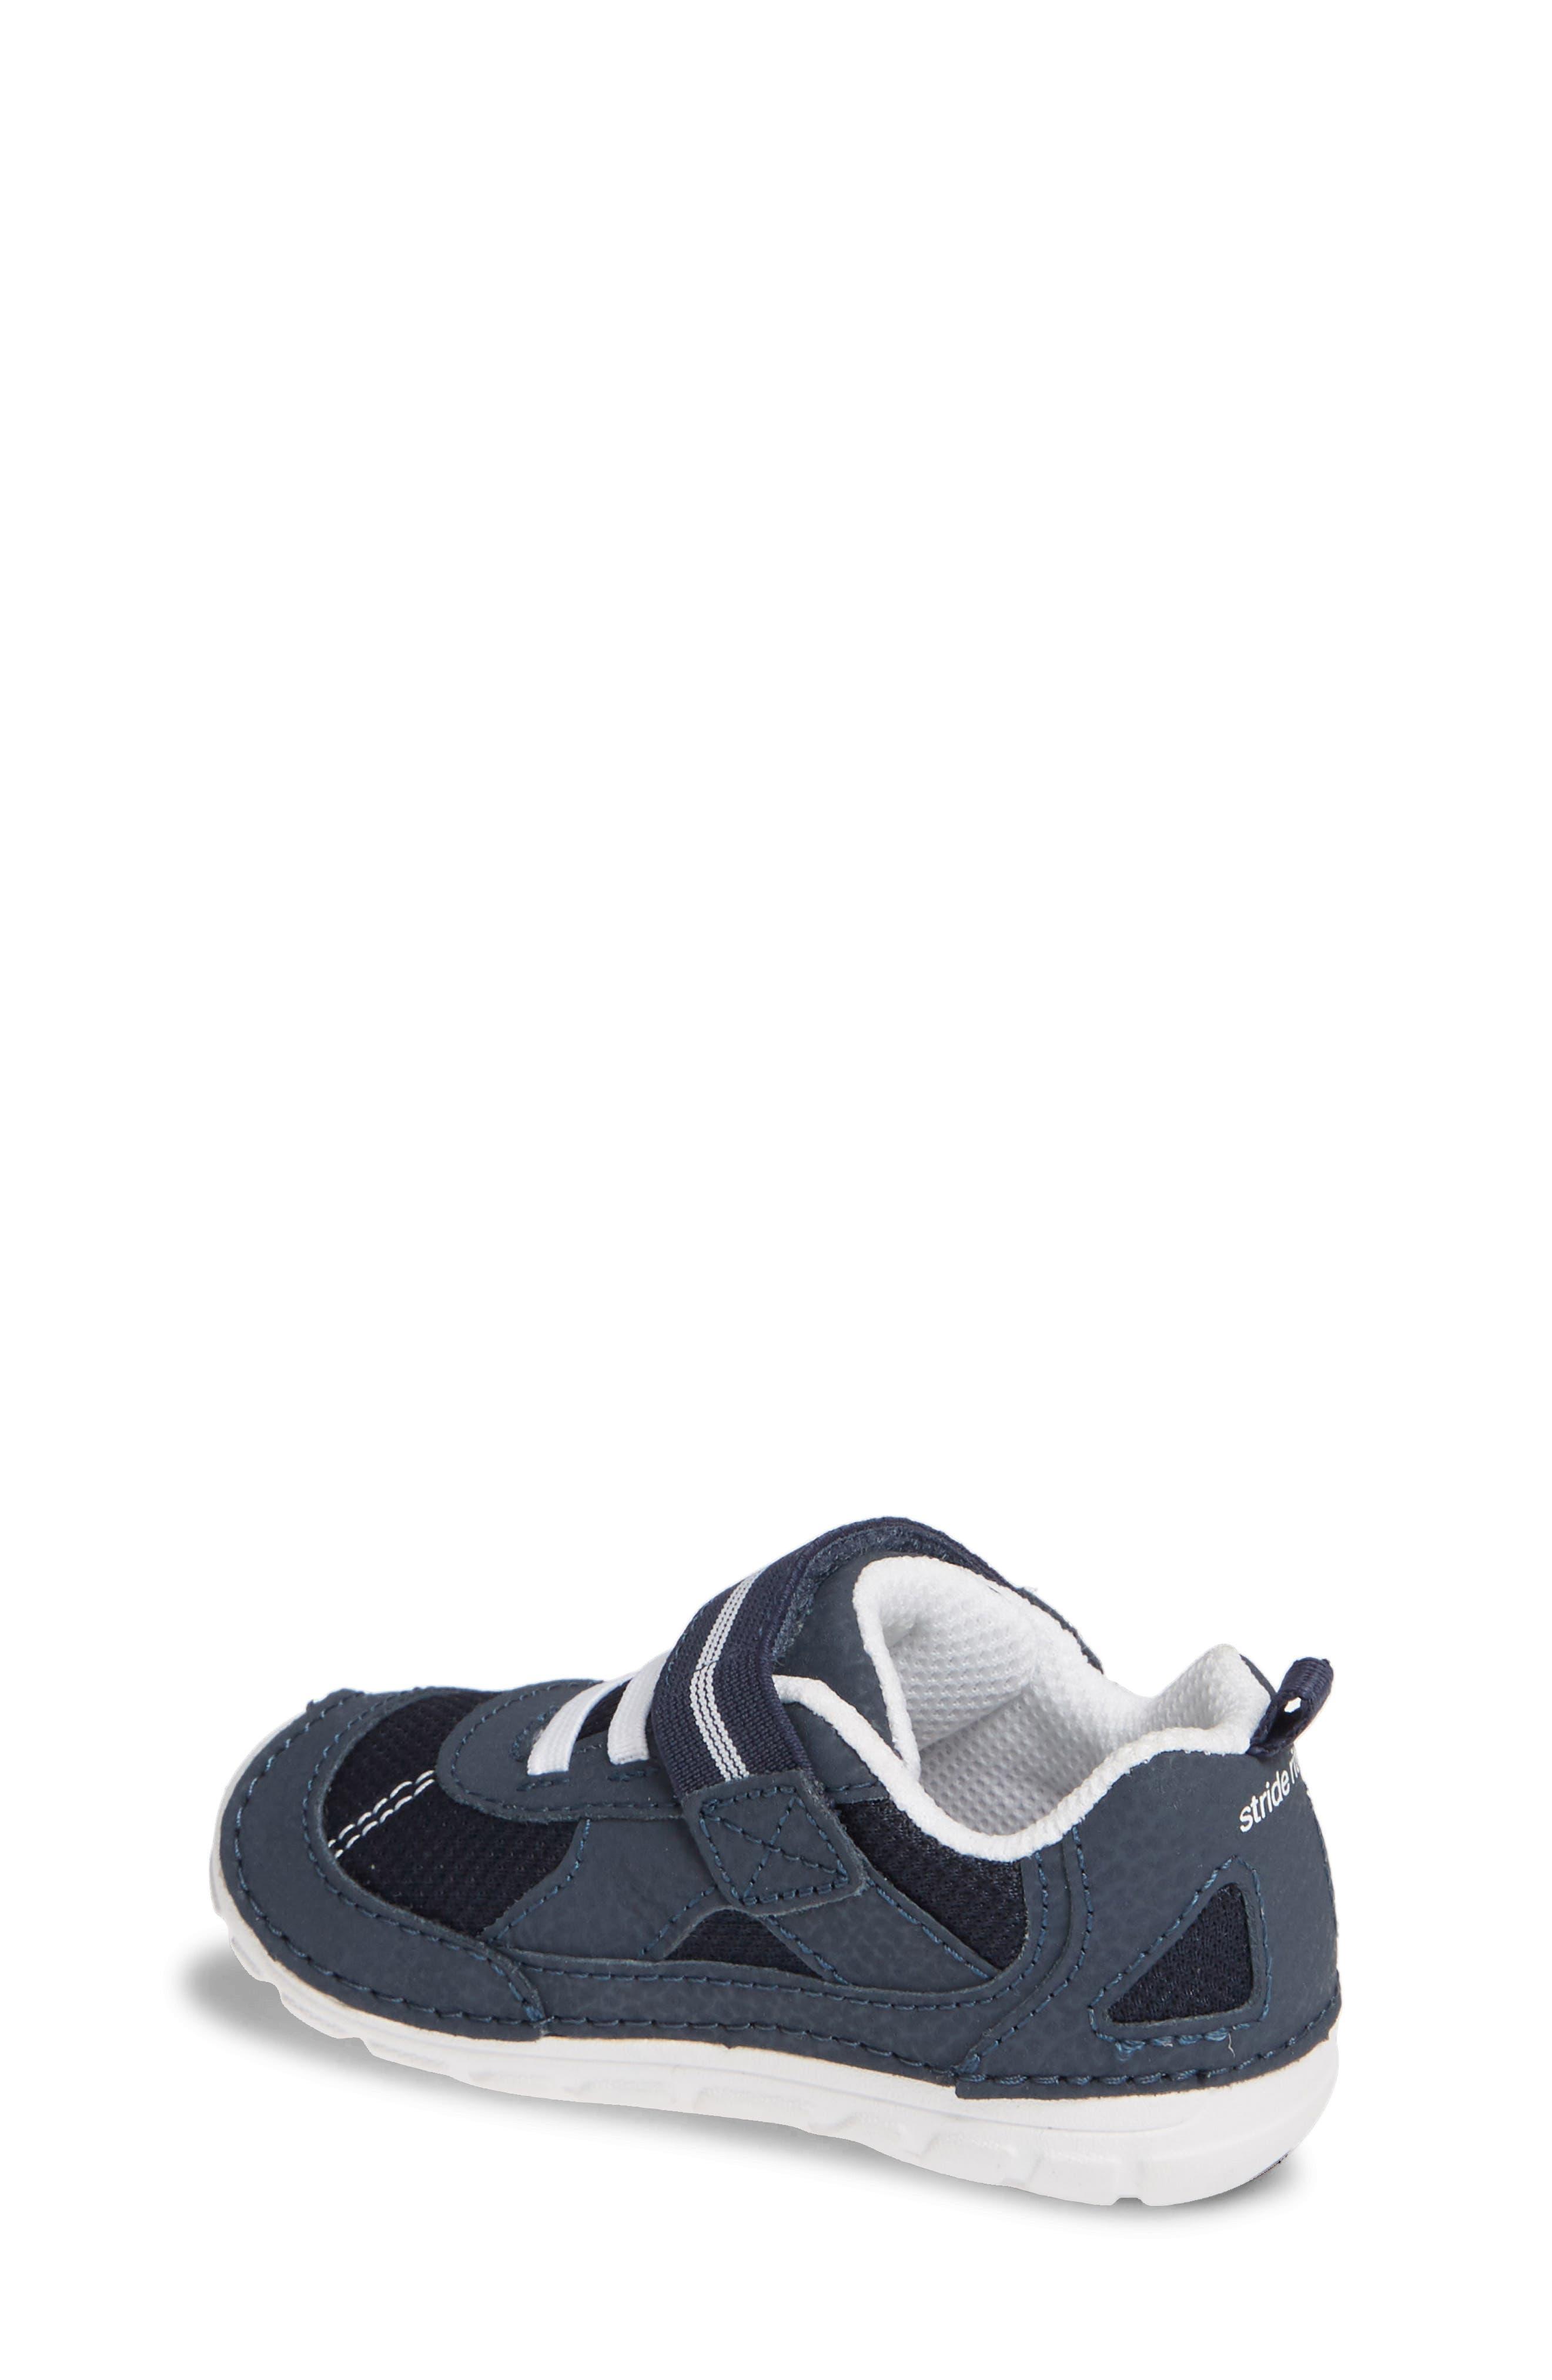 STRIDE RITE, Soft Motion<sup>™</sup> Jamie Sneaker, Alternate thumbnail 2, color, NAVY/ WHITE